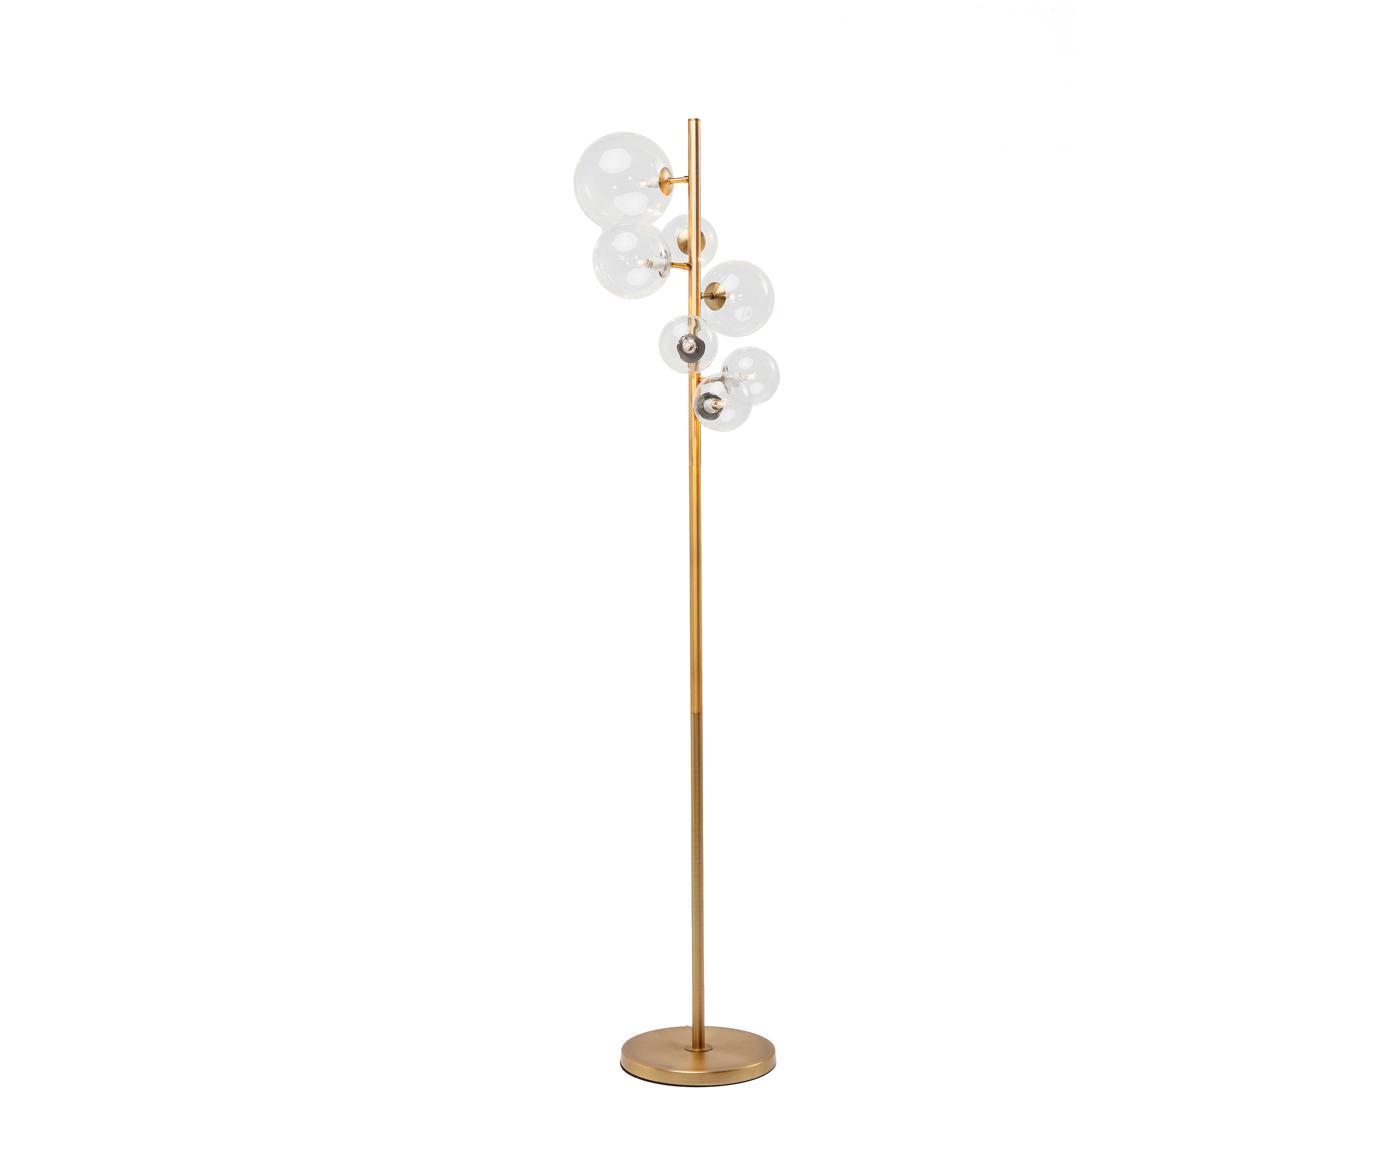 Lámpara de pie Bello Sette, Transparente, latón, An 42 x Al 162 cm